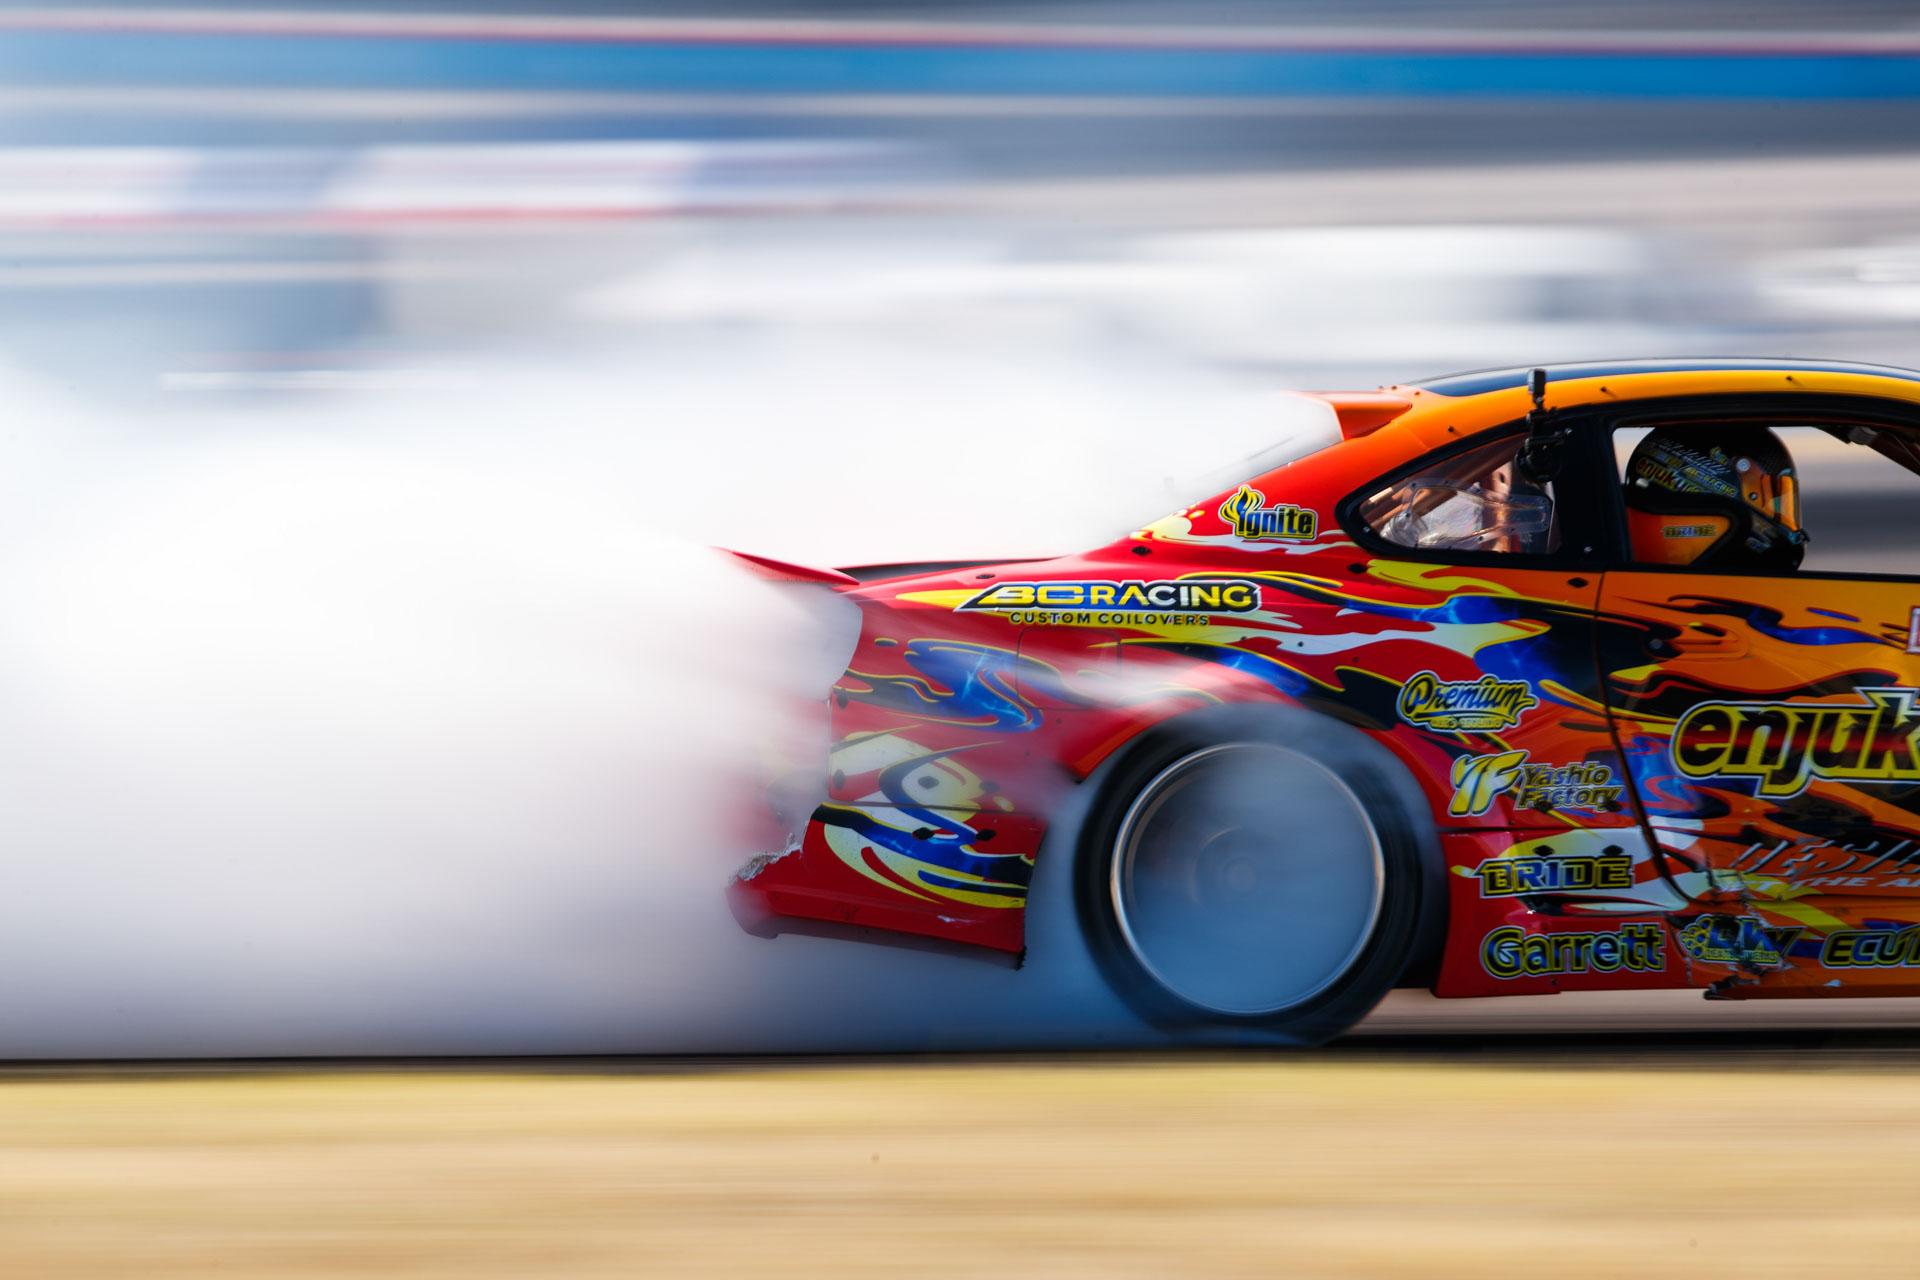 bc-racing-na-adam-lz-gallery-6985